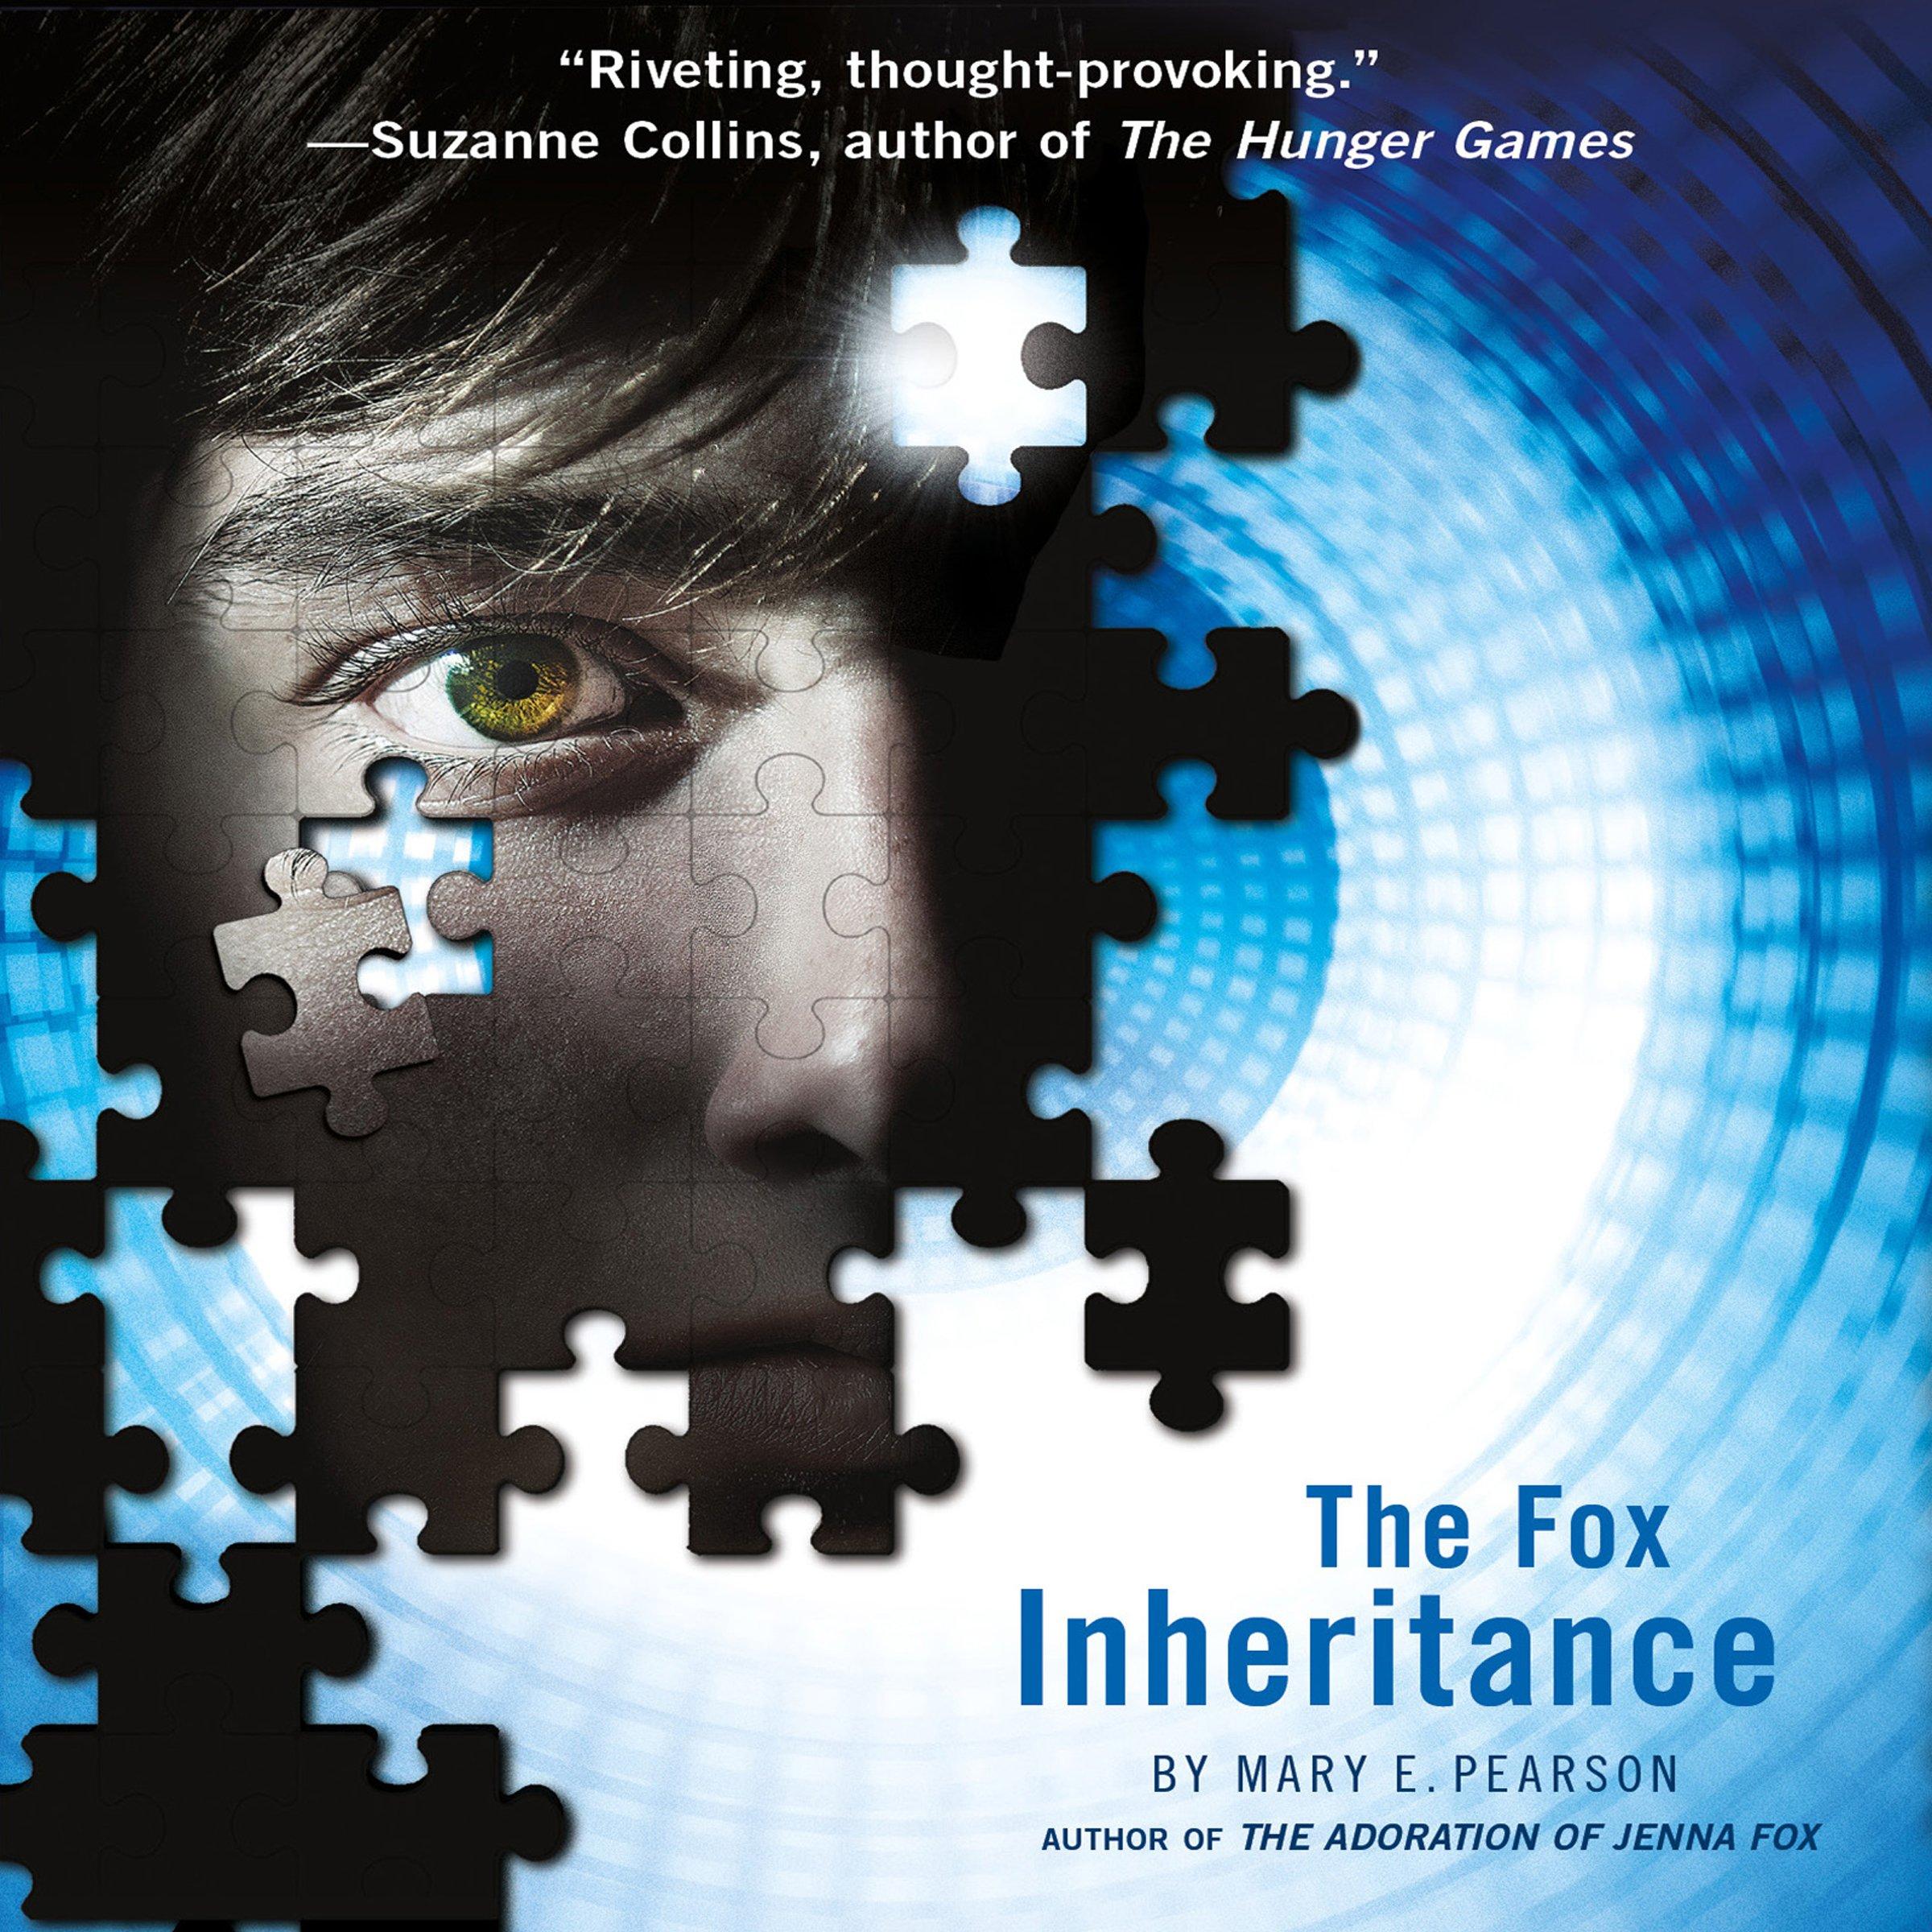 The Fox Inheritance: The Jenna Fox Chronicles, Book 2